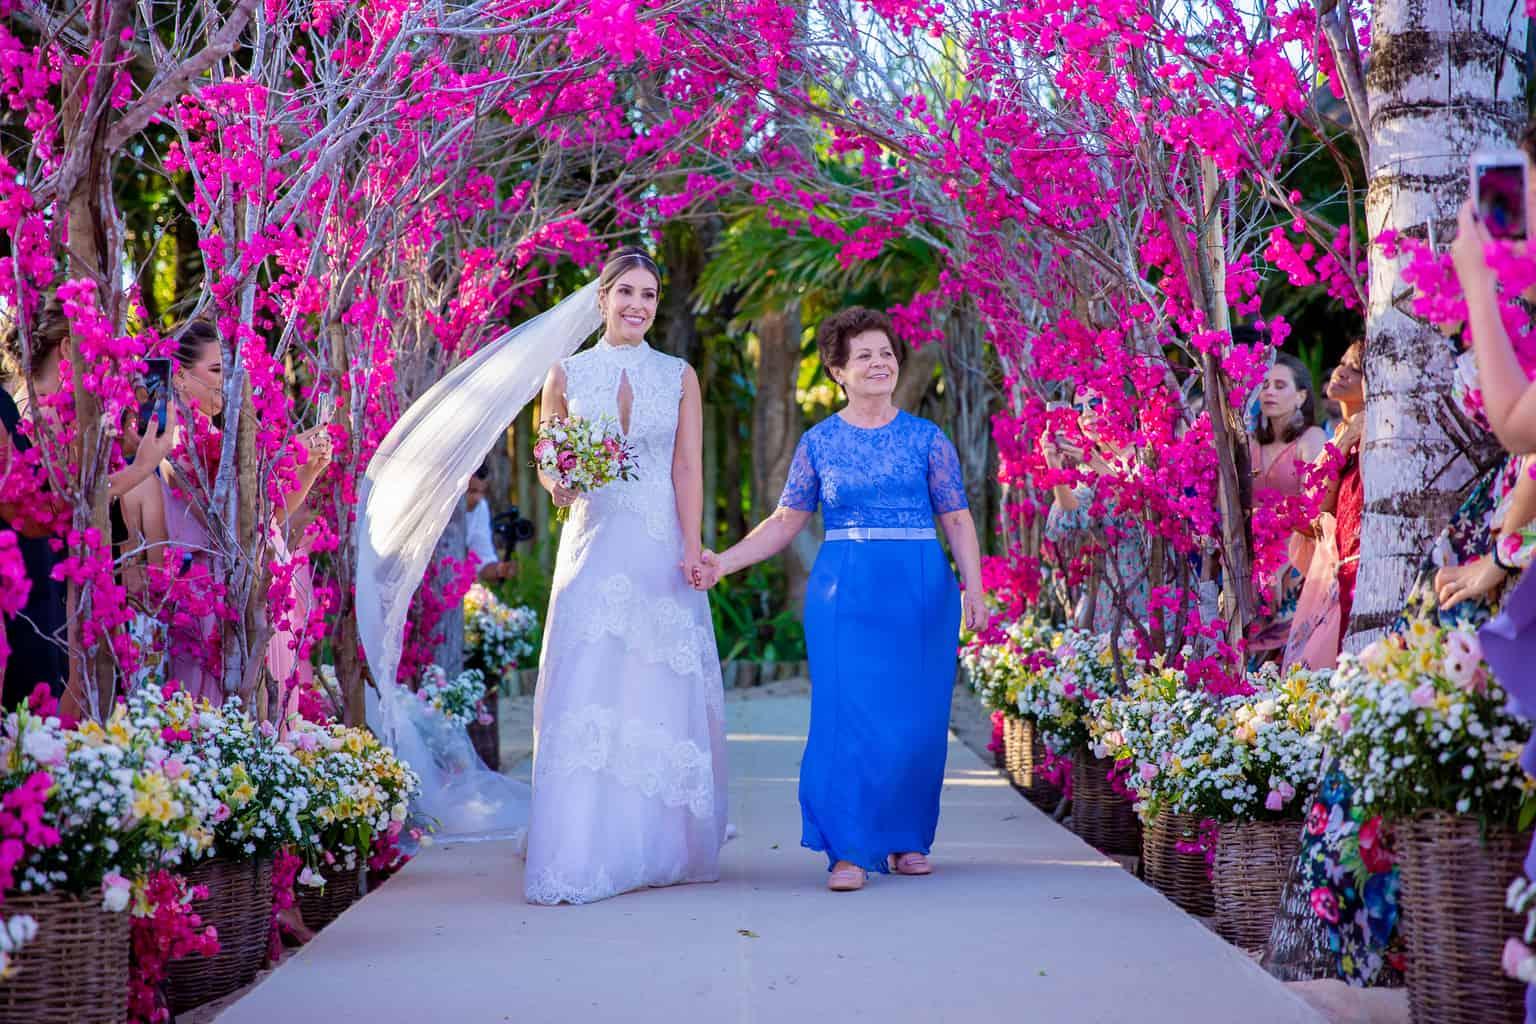 casamento-Taina-e-Hugo-Itapororoca-Villa-Trancoso-Patricia-Galvao-Sotter-Fotografia-Cerimonia-na-praia553